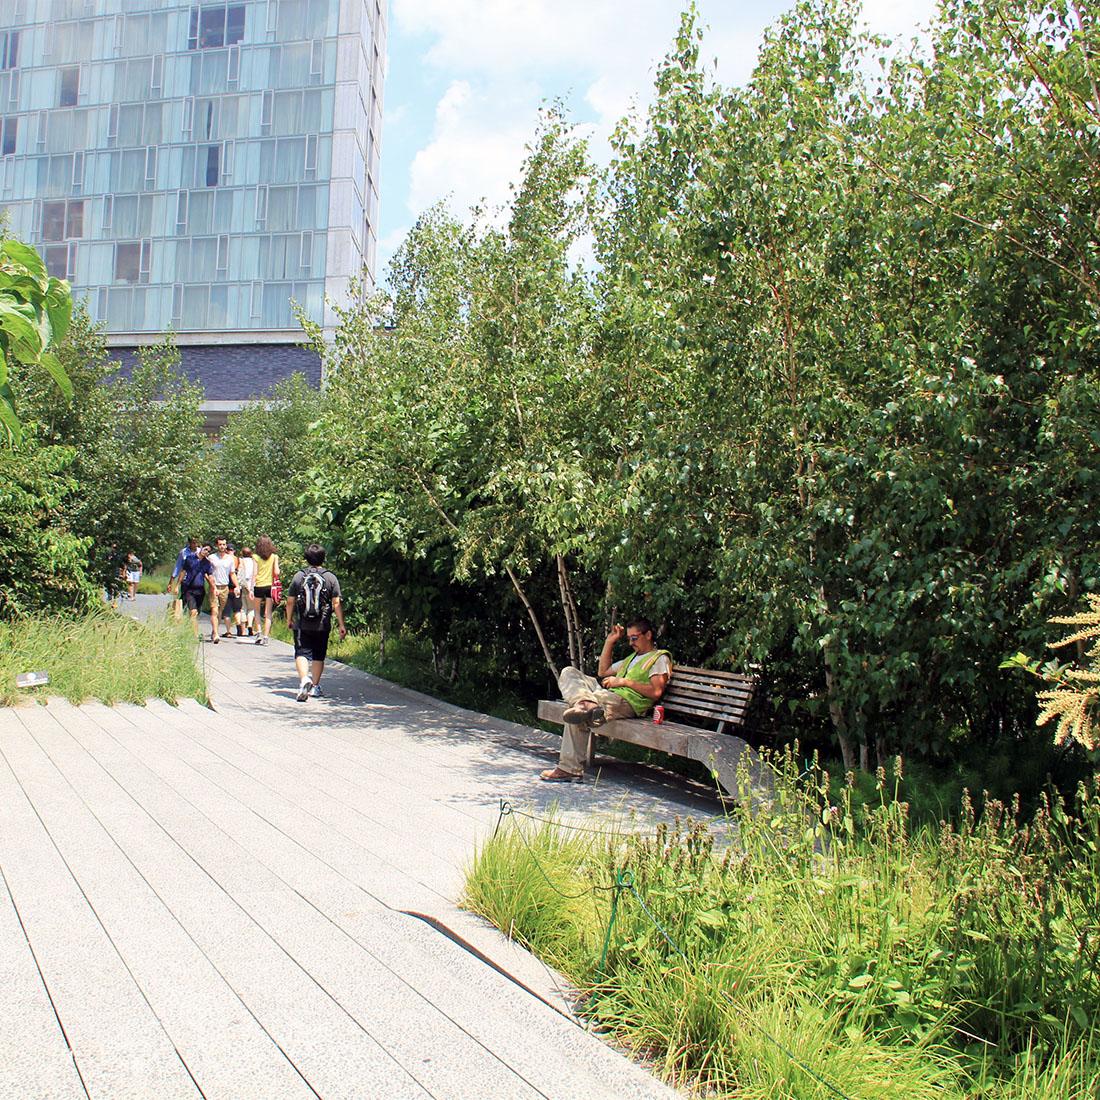 The New York High Line